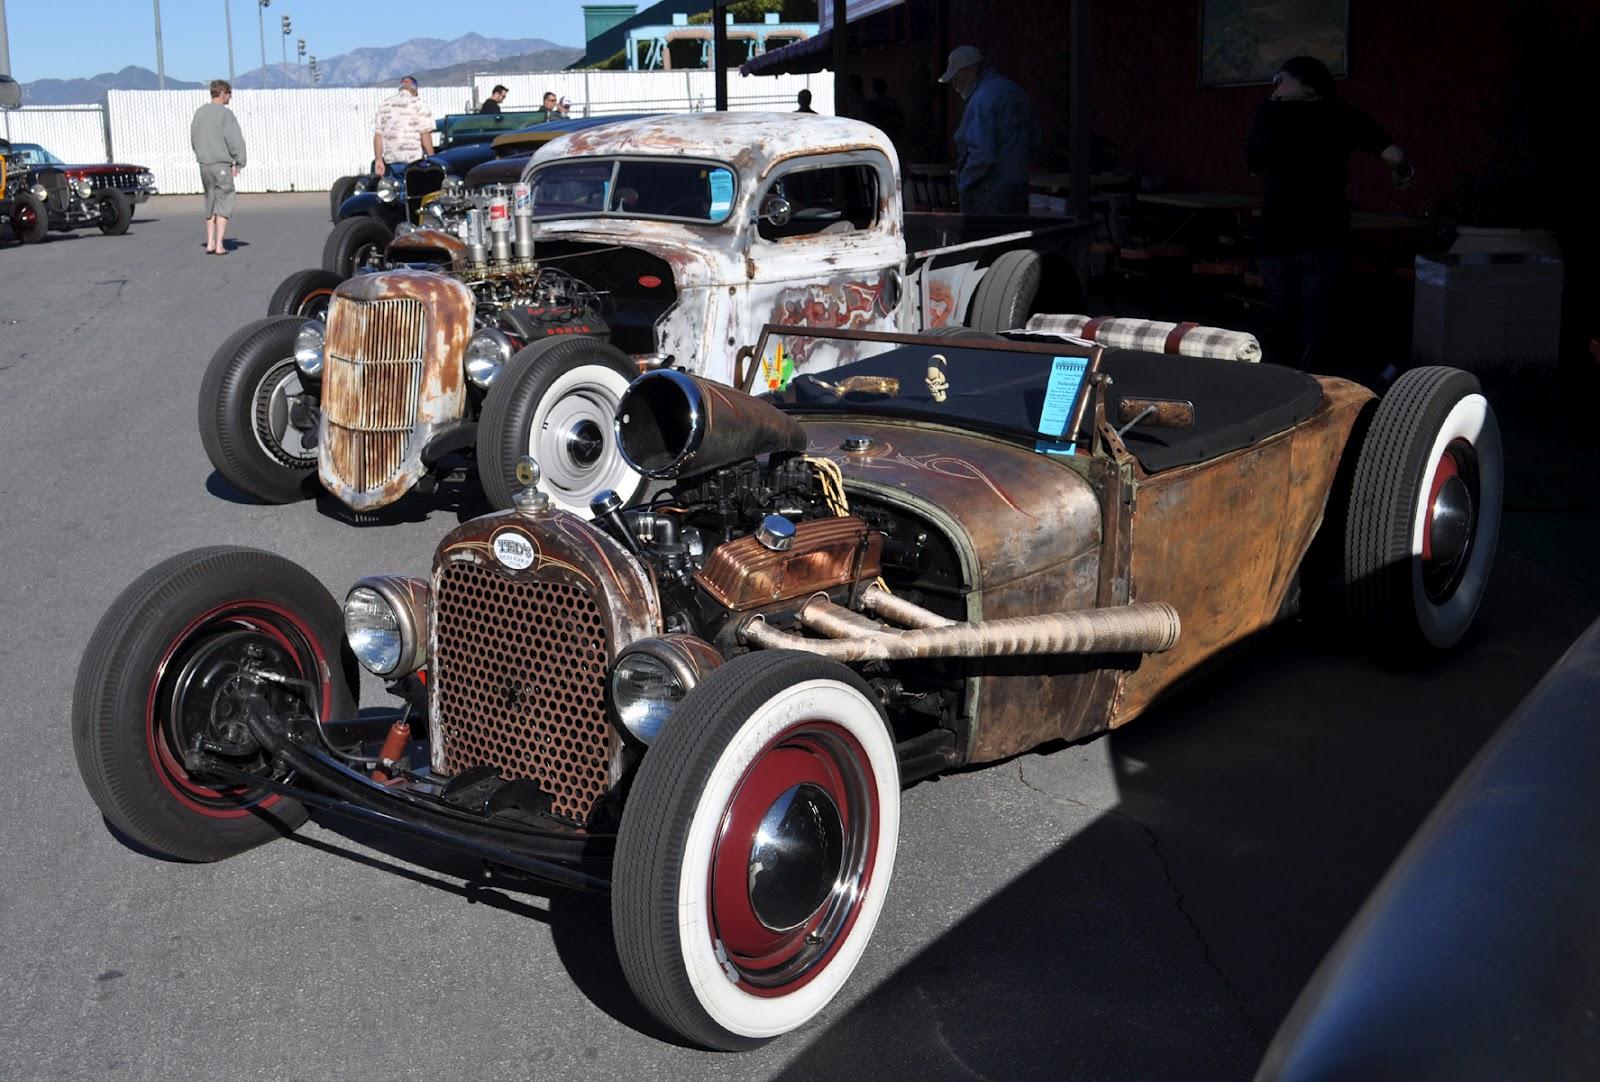 rat rod cars best - photo #1